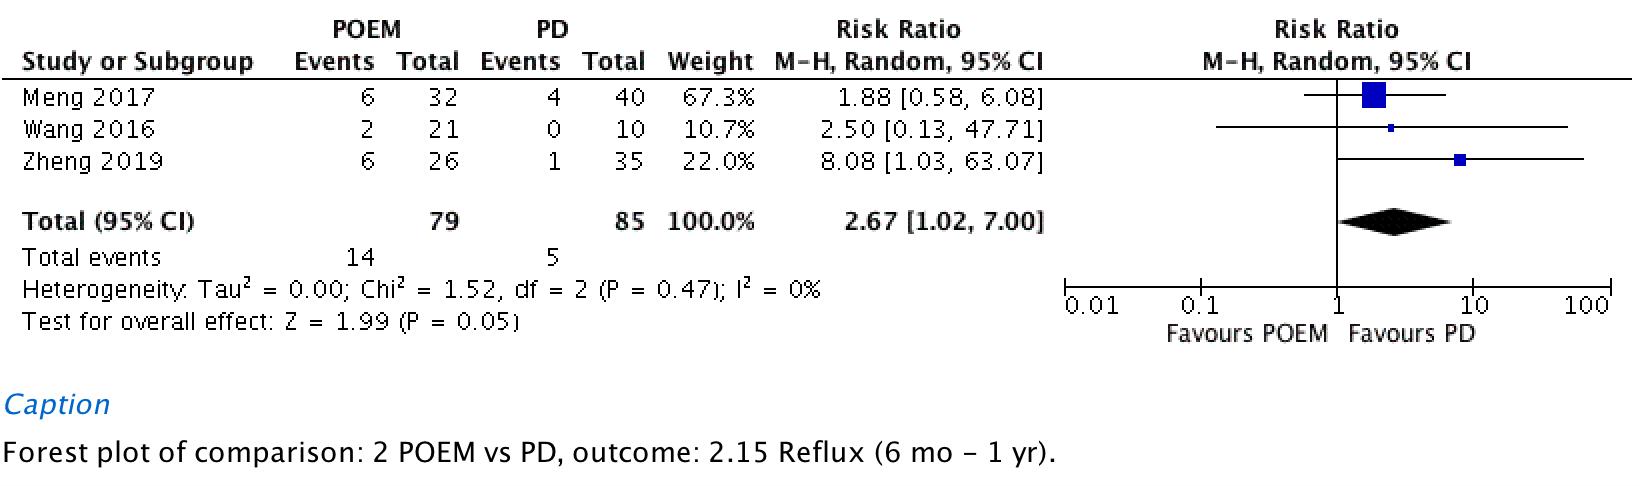 Short-term patient reported reflux